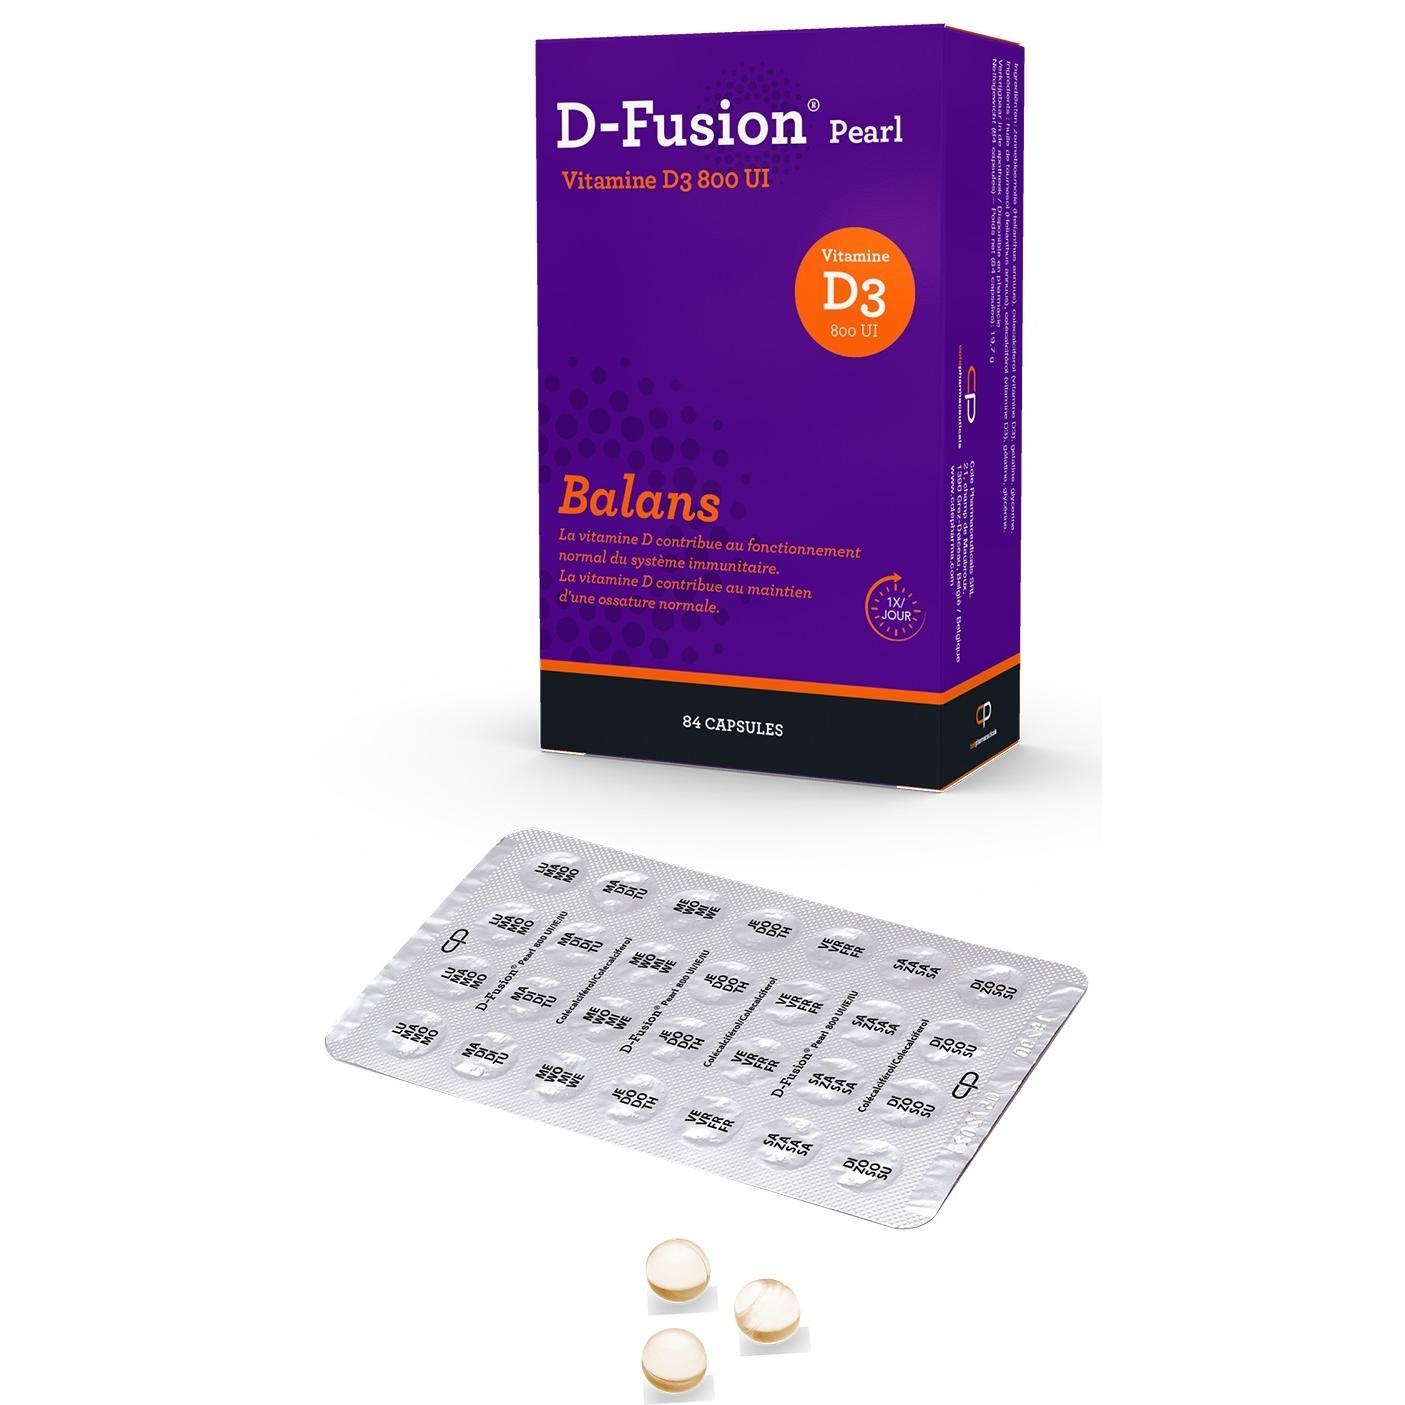 Image of D-Fusion Pearl 800IU